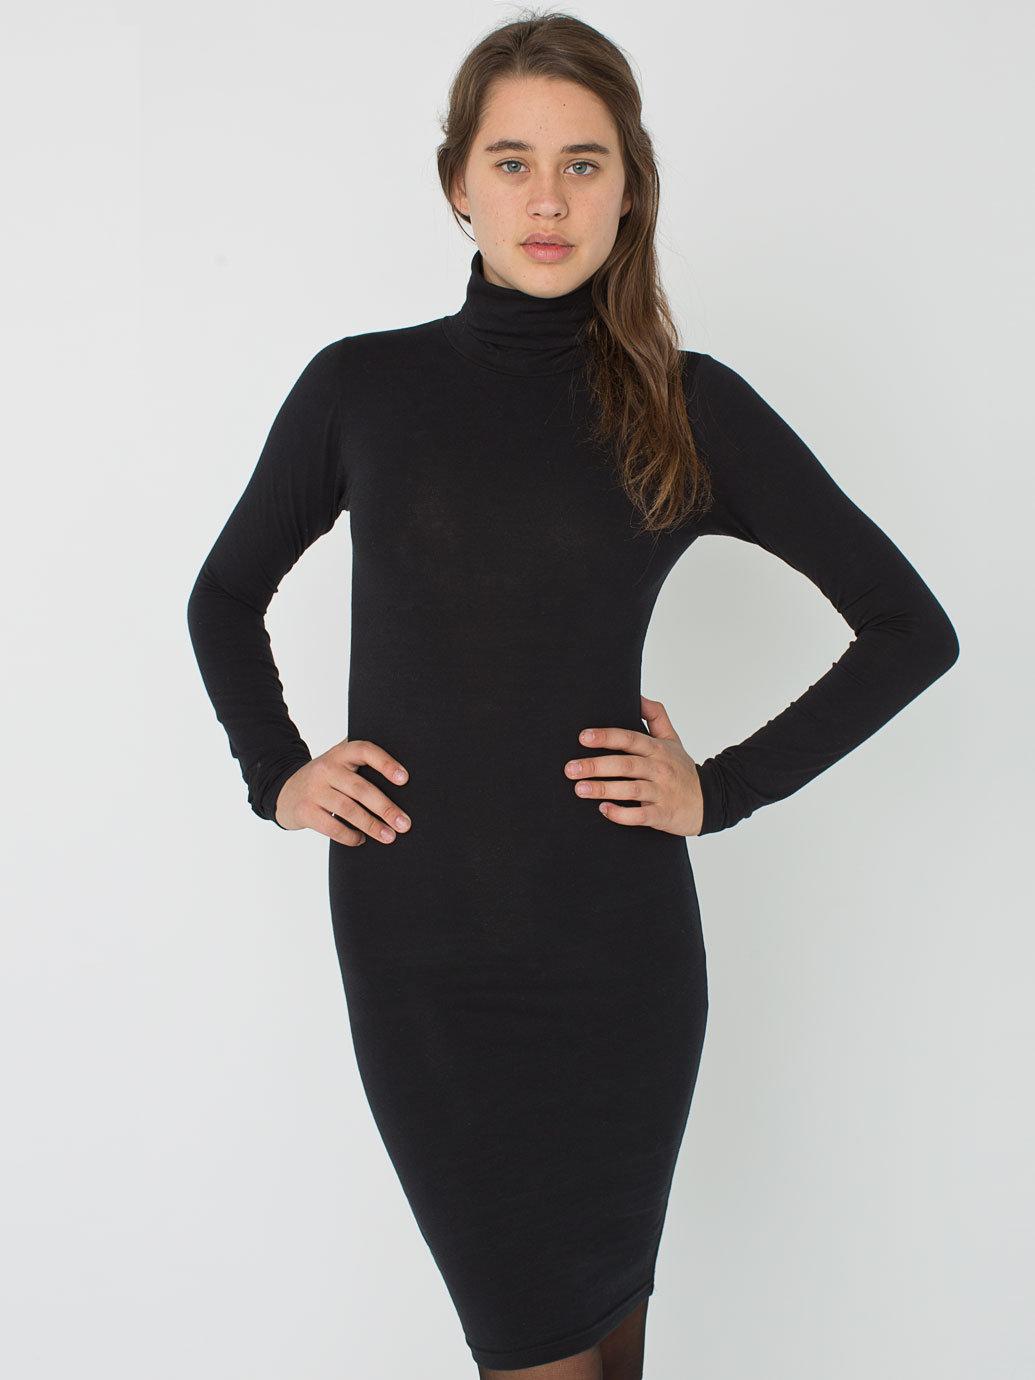 Cotton spandex jersey turtleneck dress